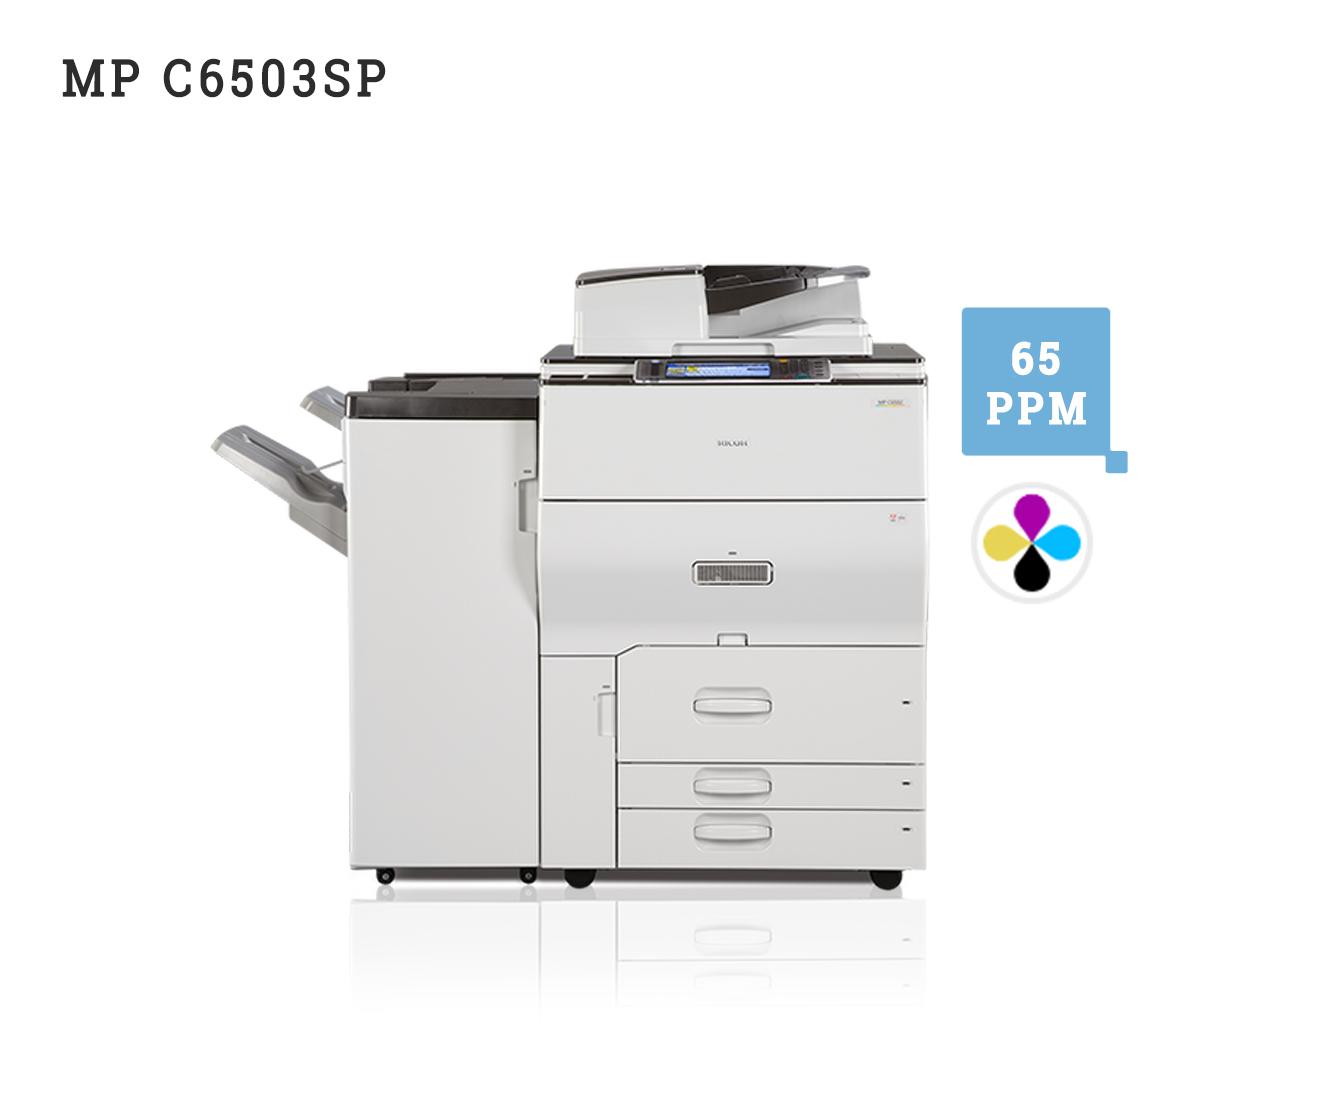 mpc6503